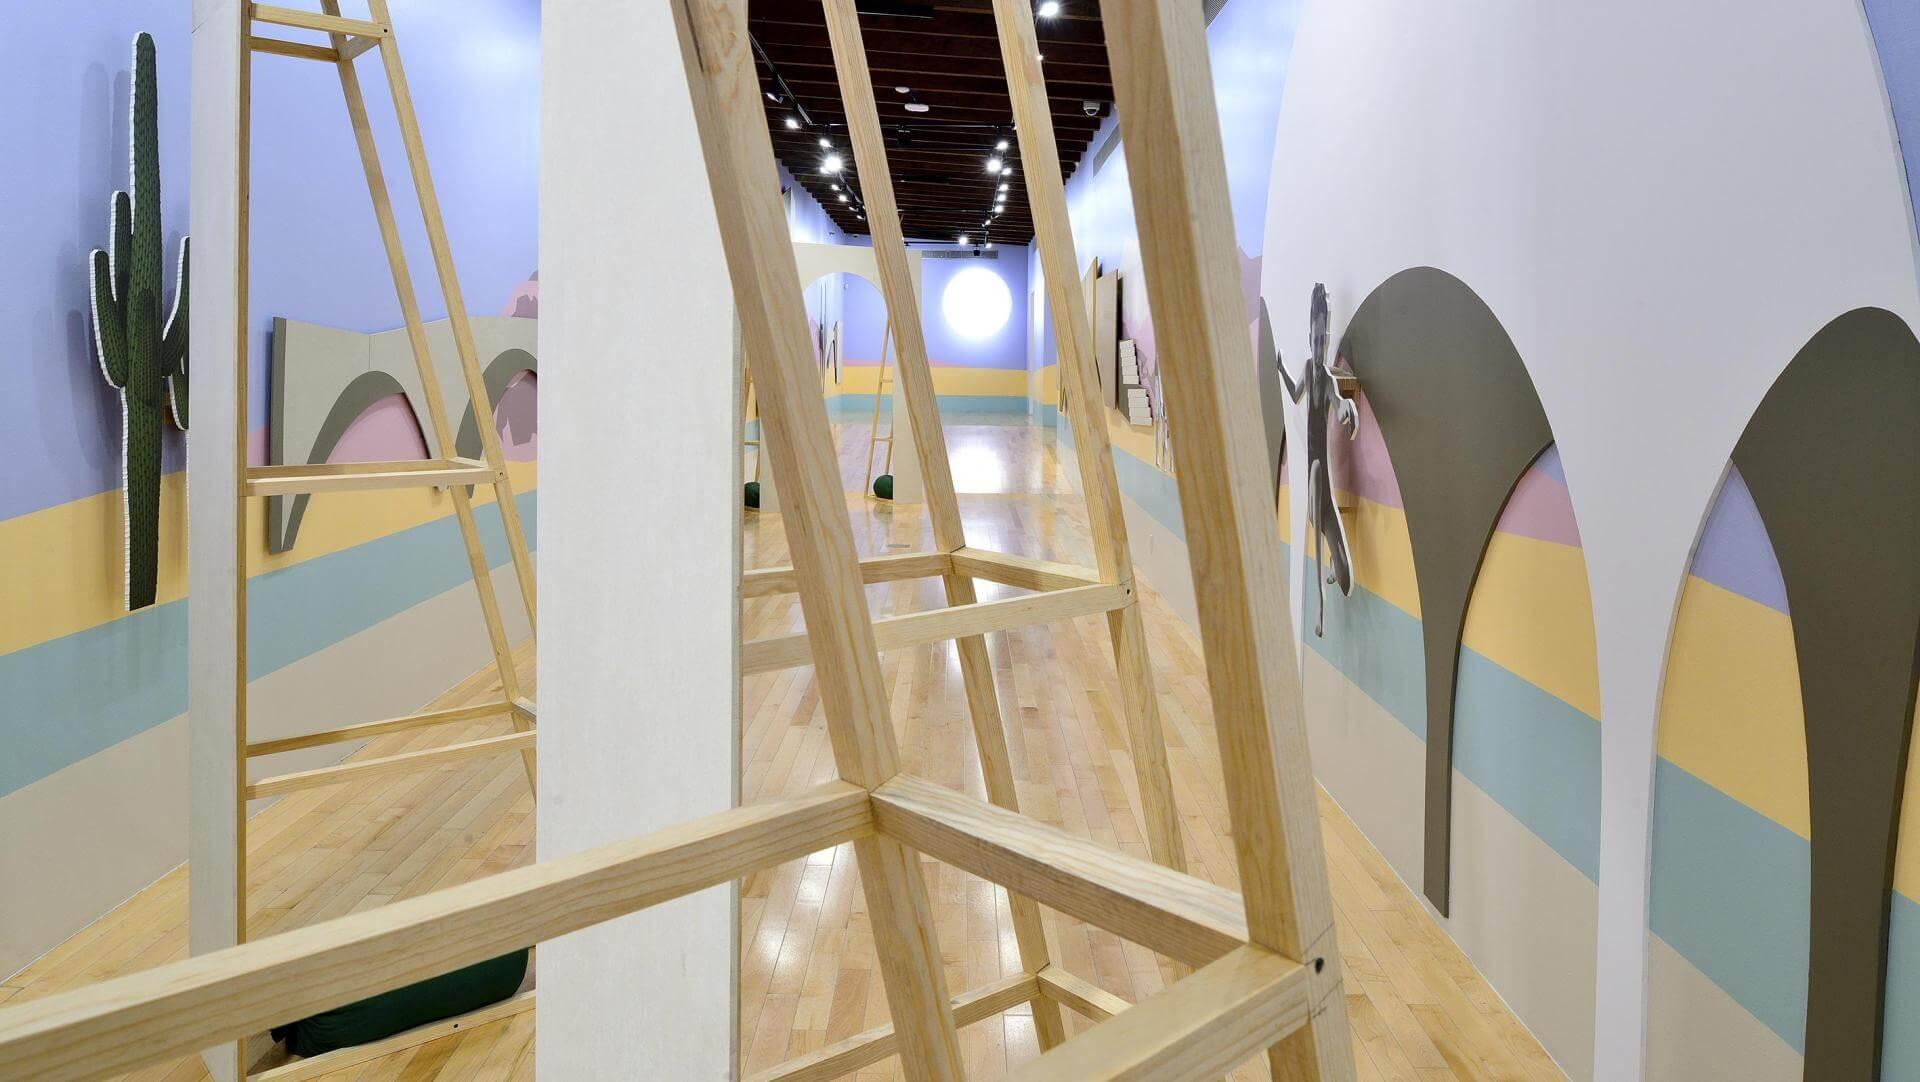 Perspectivas tatiana bilbao estudio exposiciones - Estudios arquitectura bilbao ...